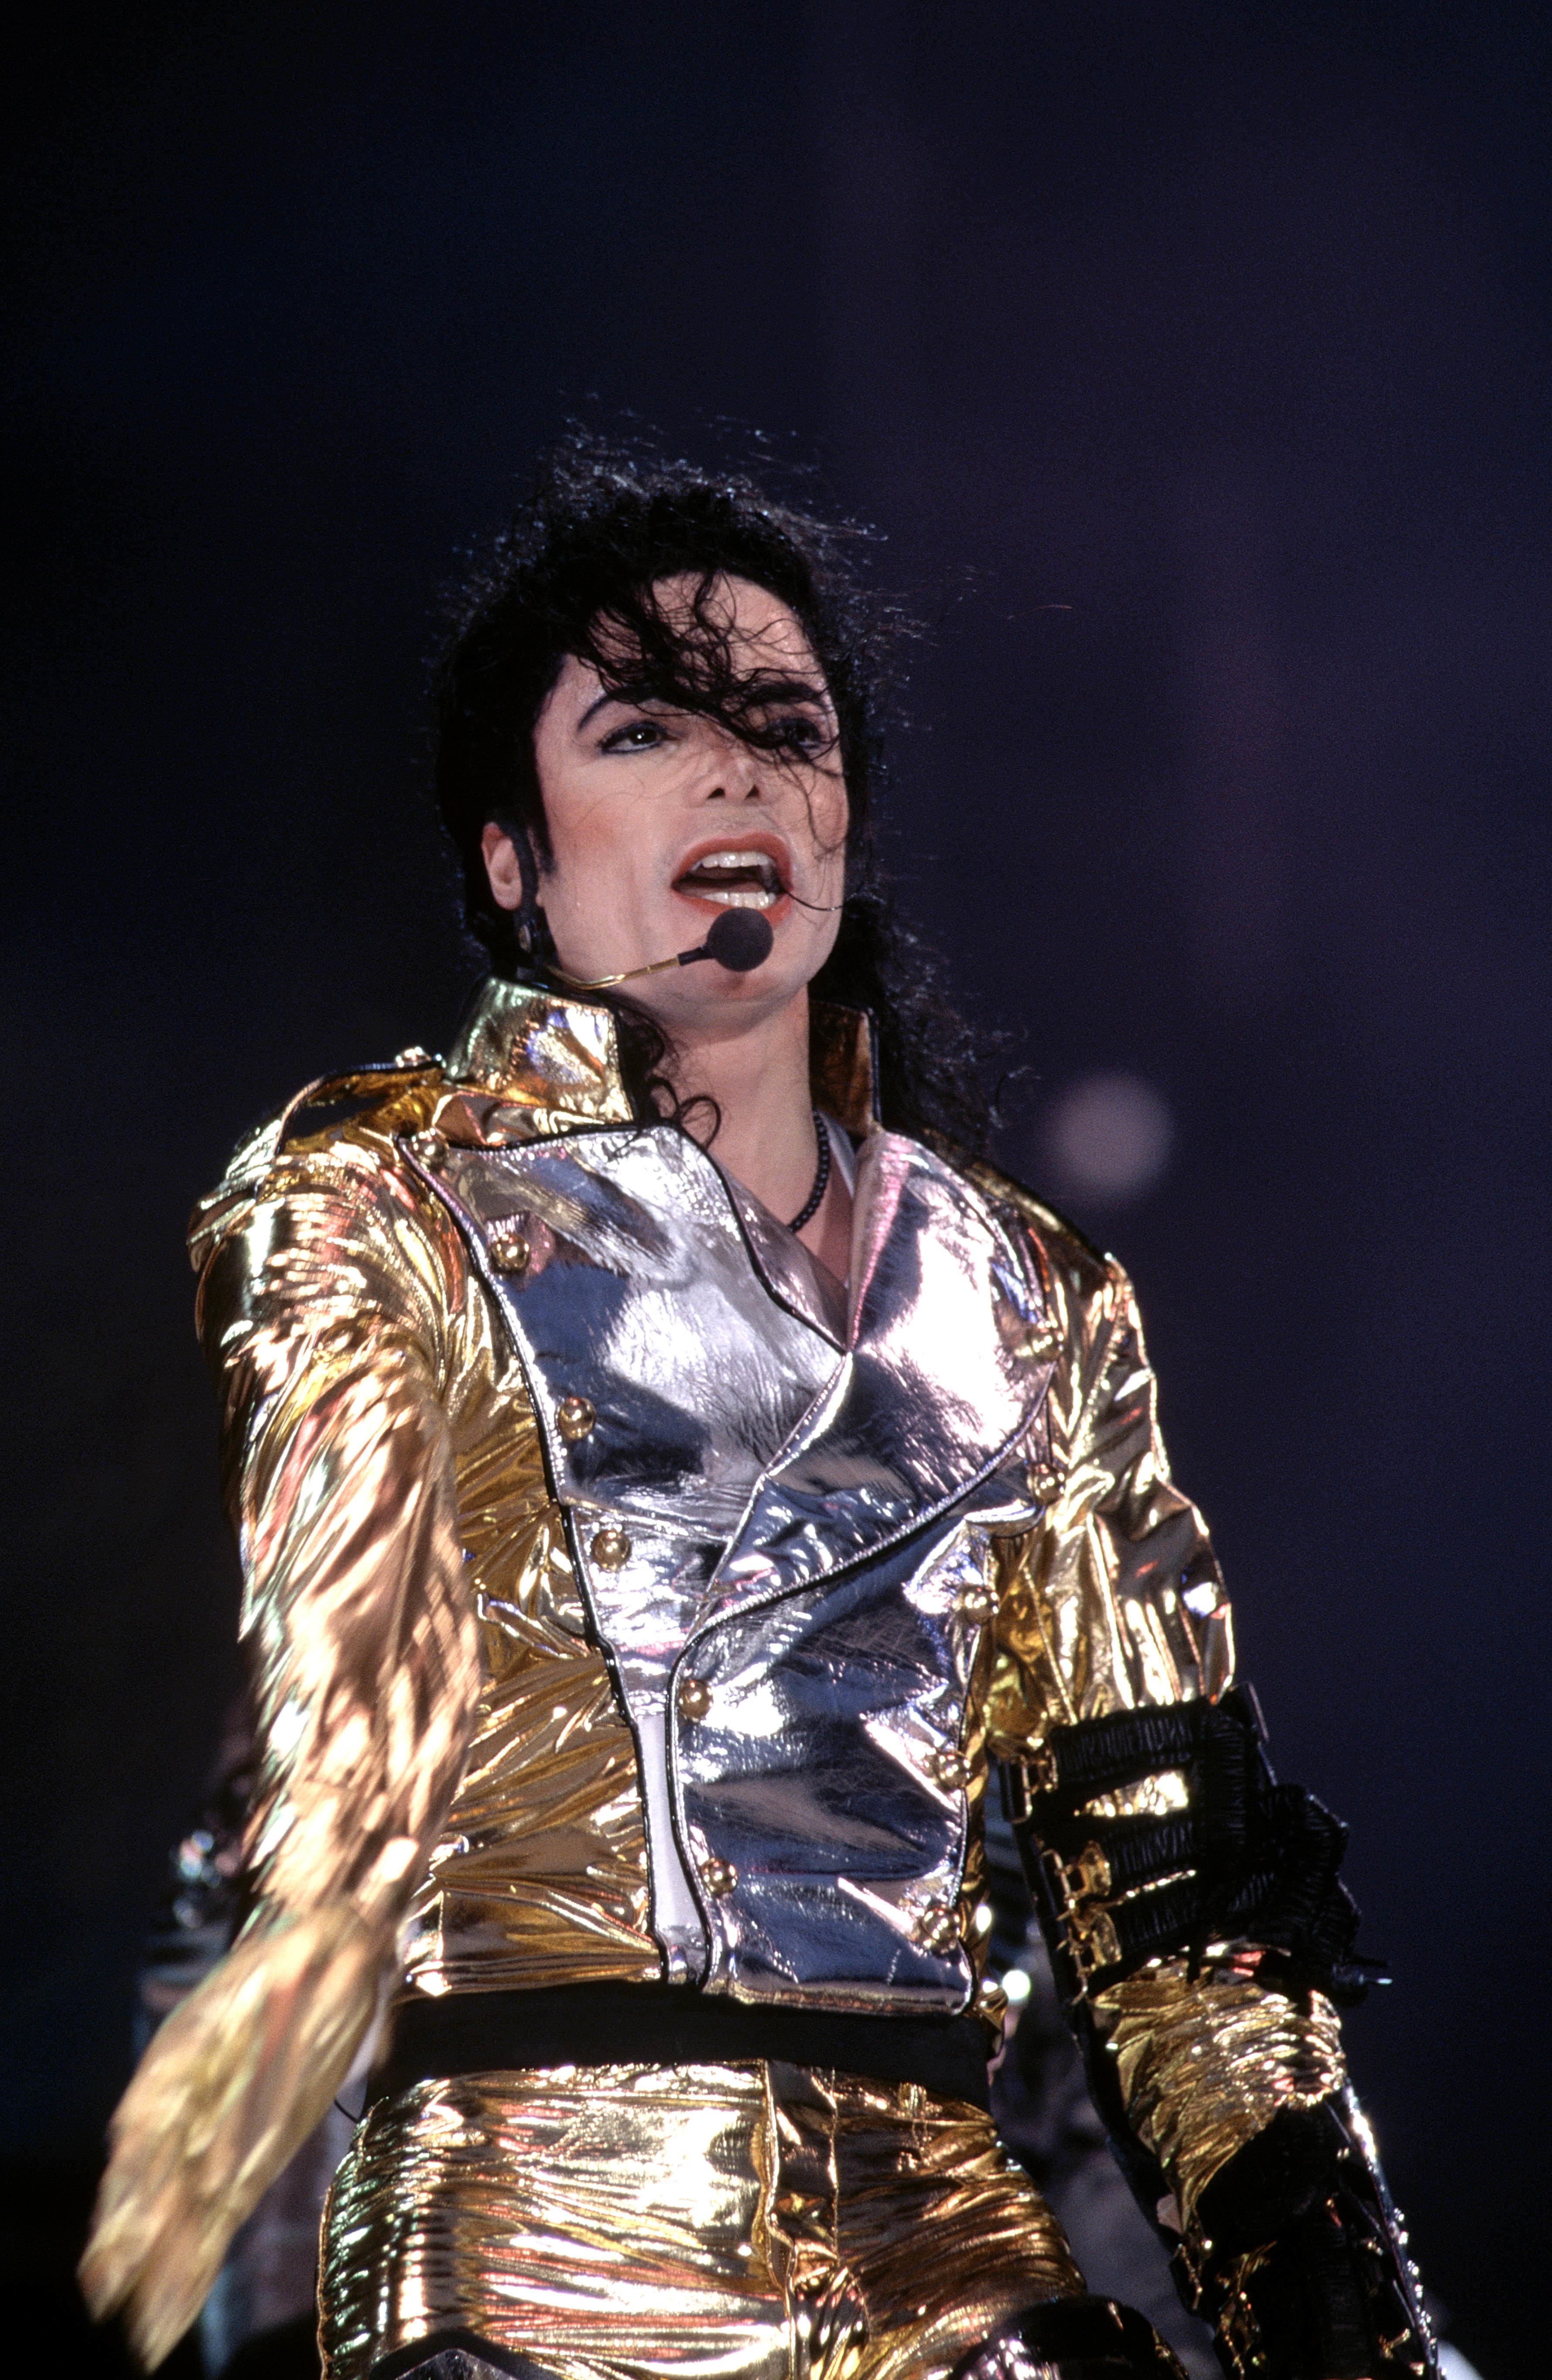 Michael Jackson performing in